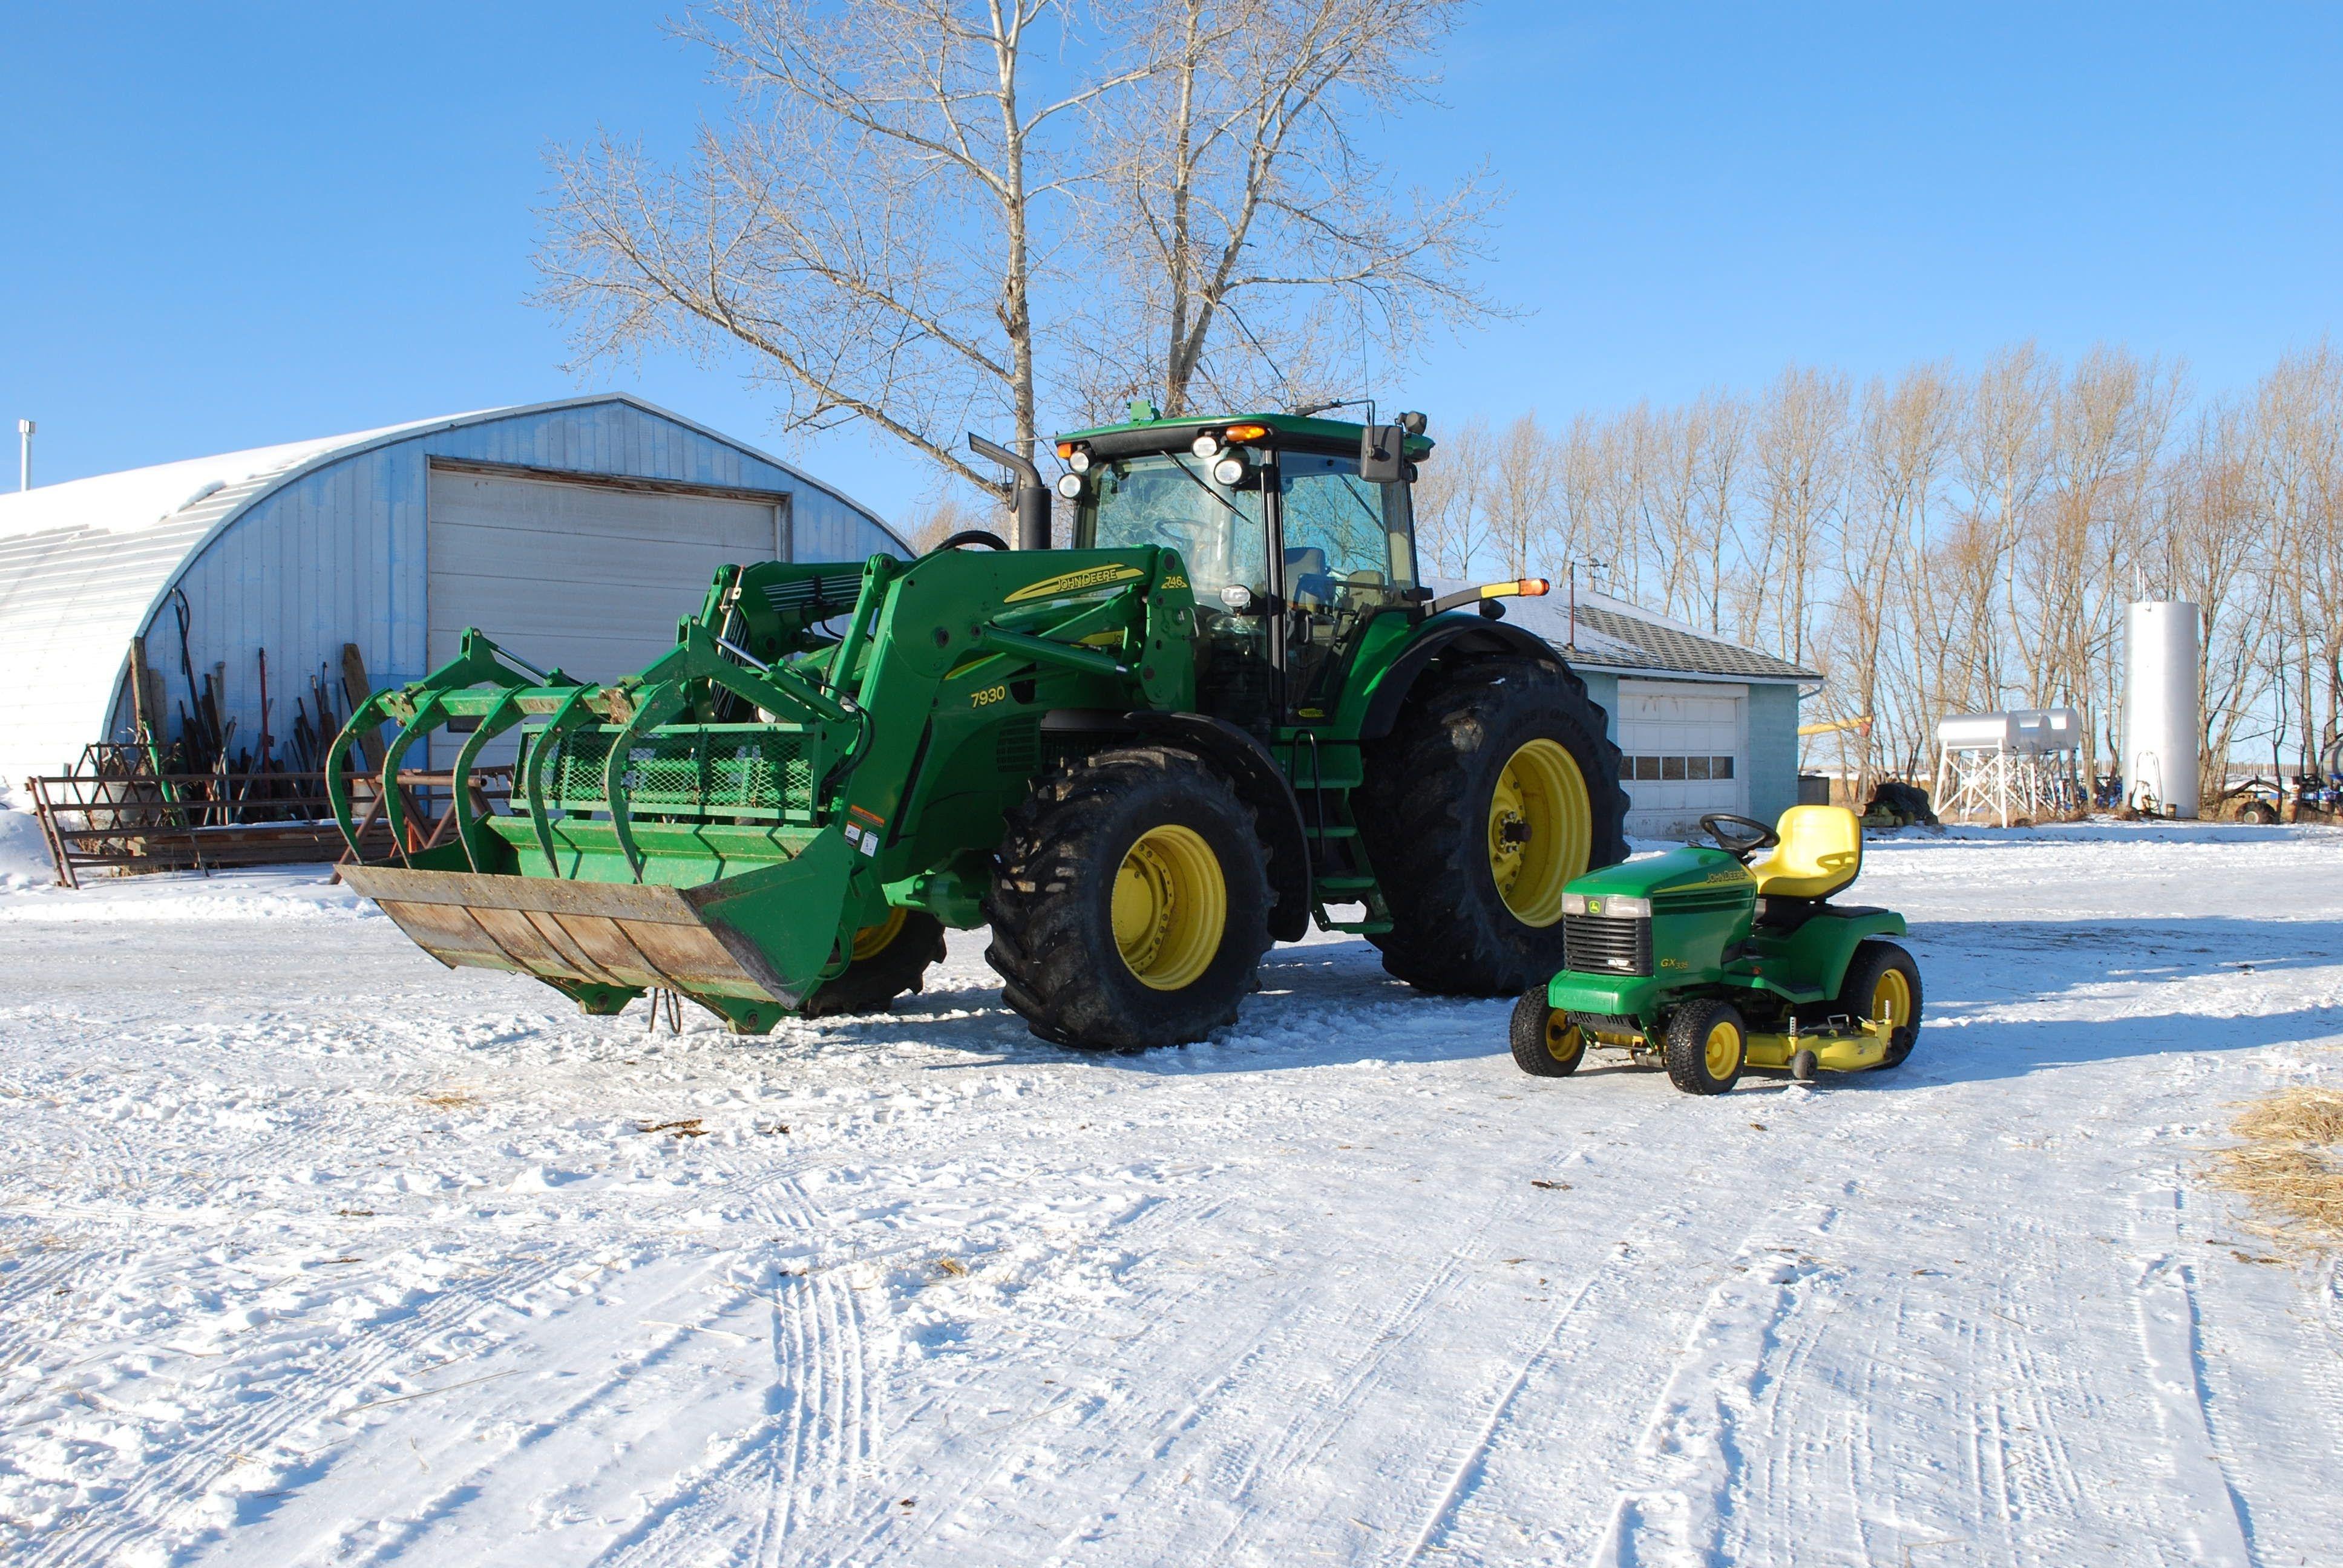 Traktor Ausmalbilder John Deere Genial Claas Ausmalbilder ...